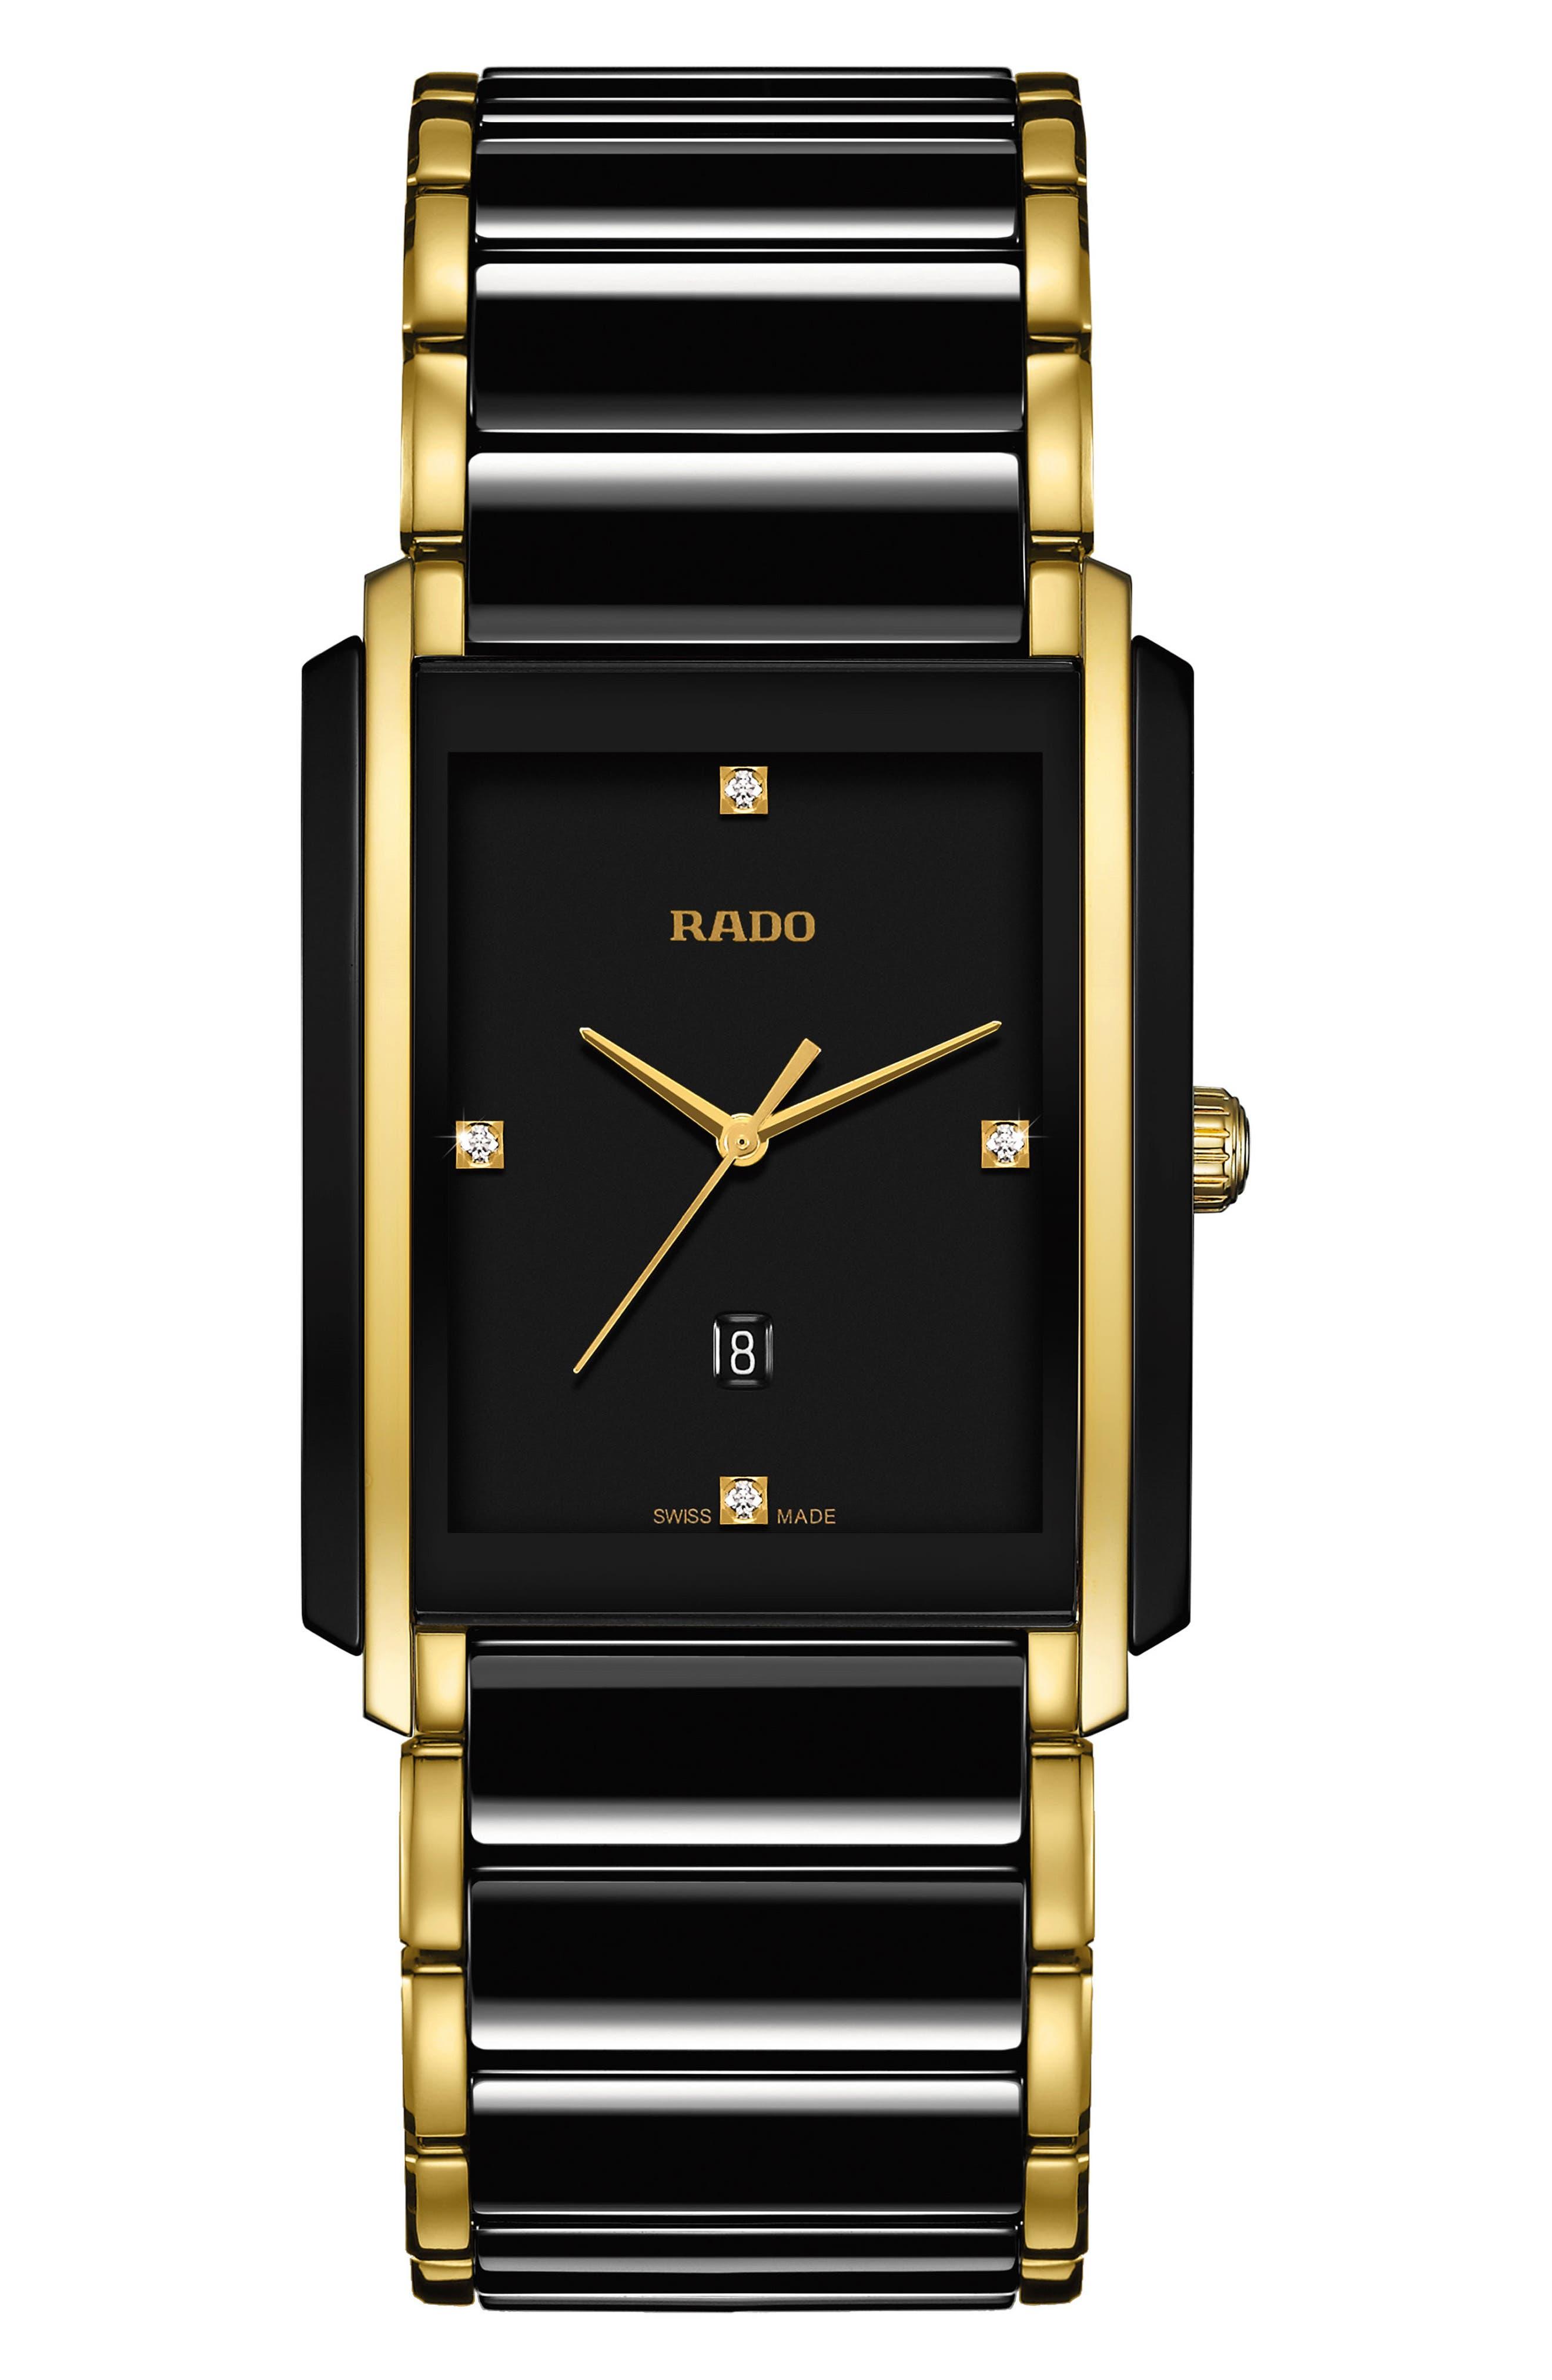 Main Image - RADO Integral Diamond Ceramic Bracelet Watch, 31mm x 41.1mm